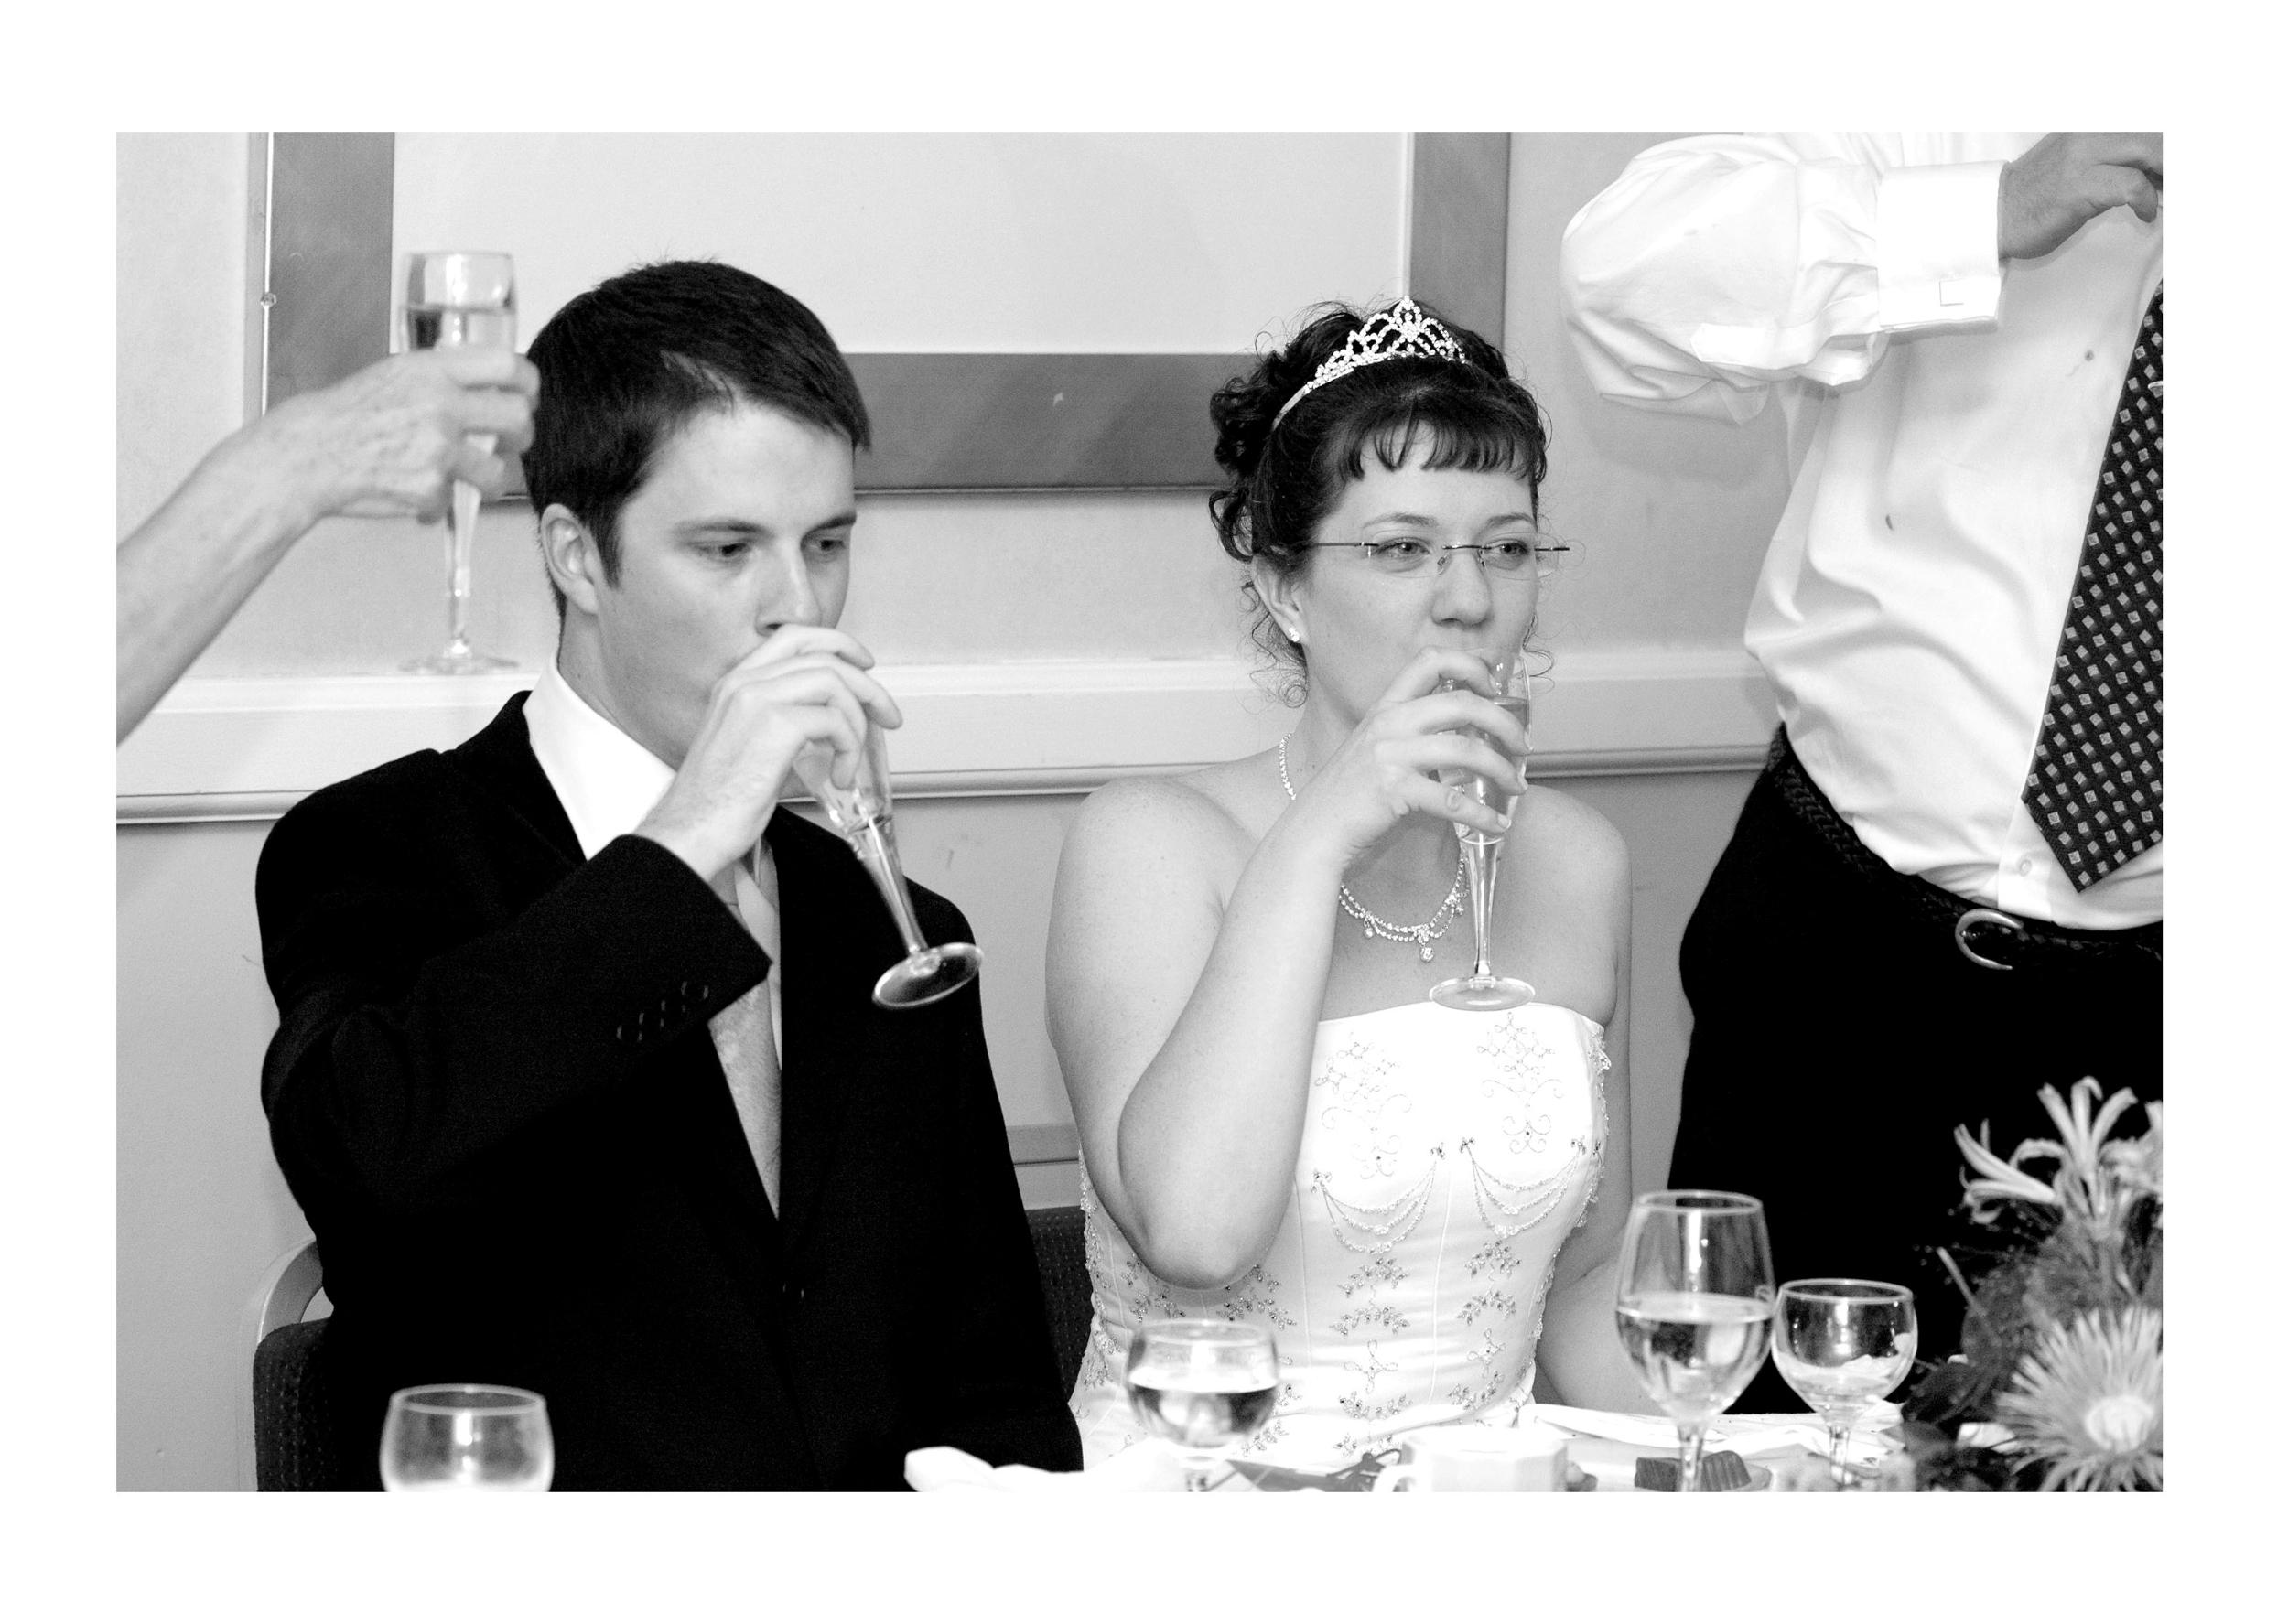 REPORTAGE-WEDDING-PHOTOGRAPHY-SET-UK-66.jpg